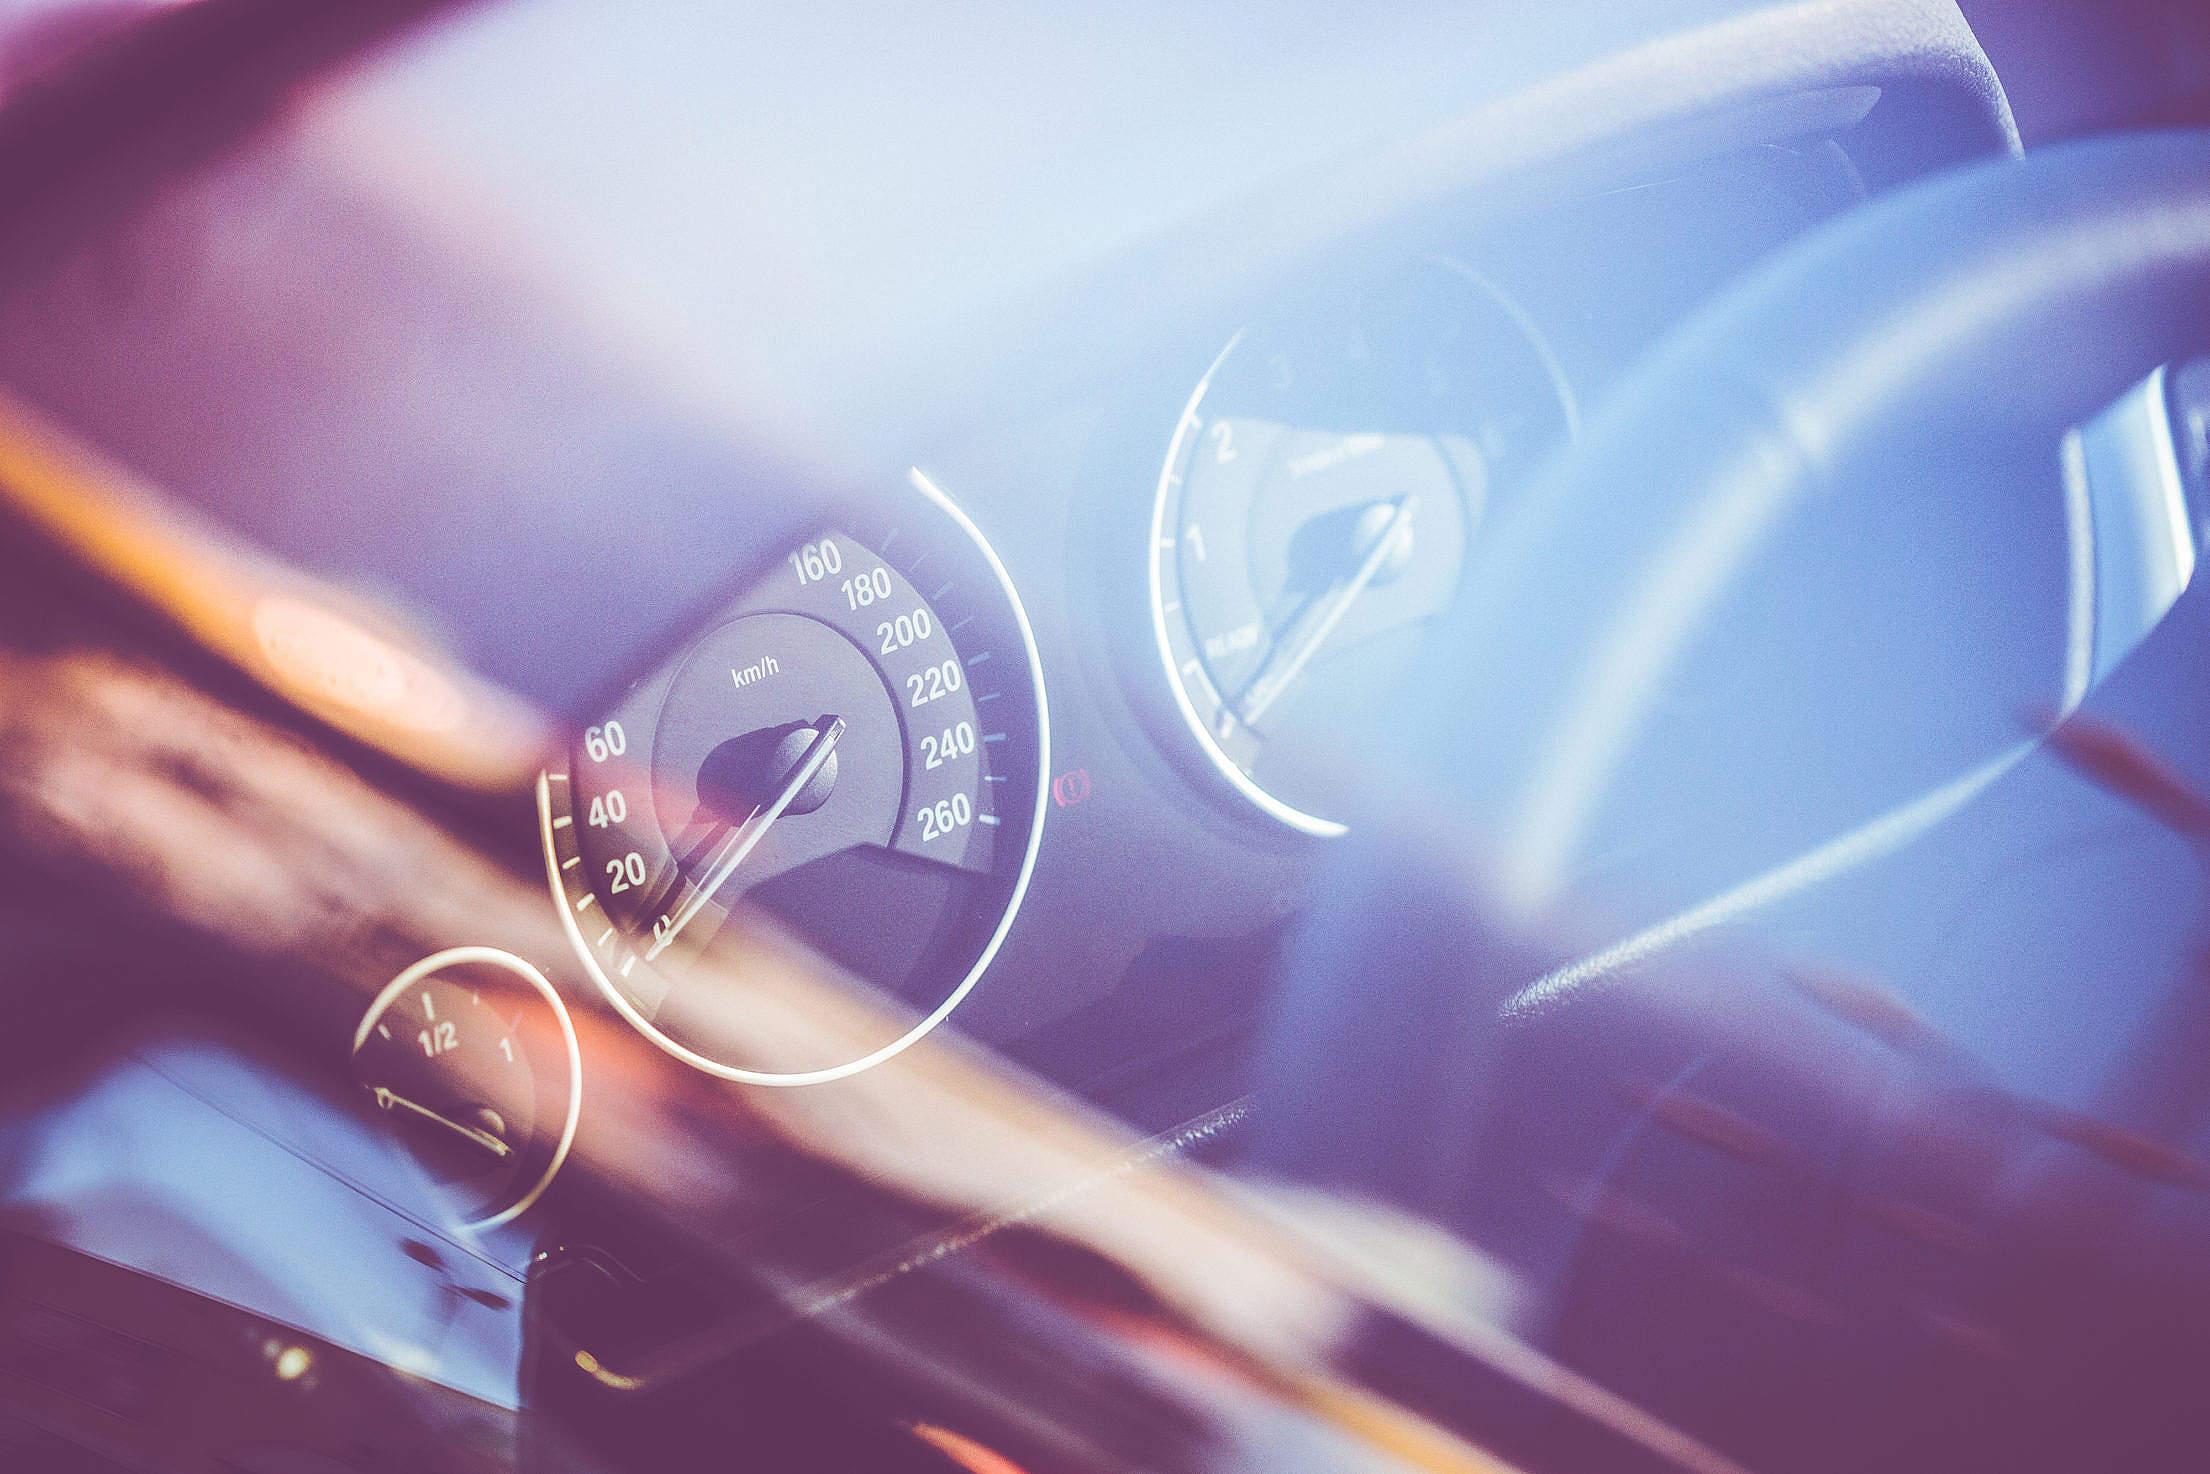 Speed-O-Meter in a Car Through Window Free Stock Photo